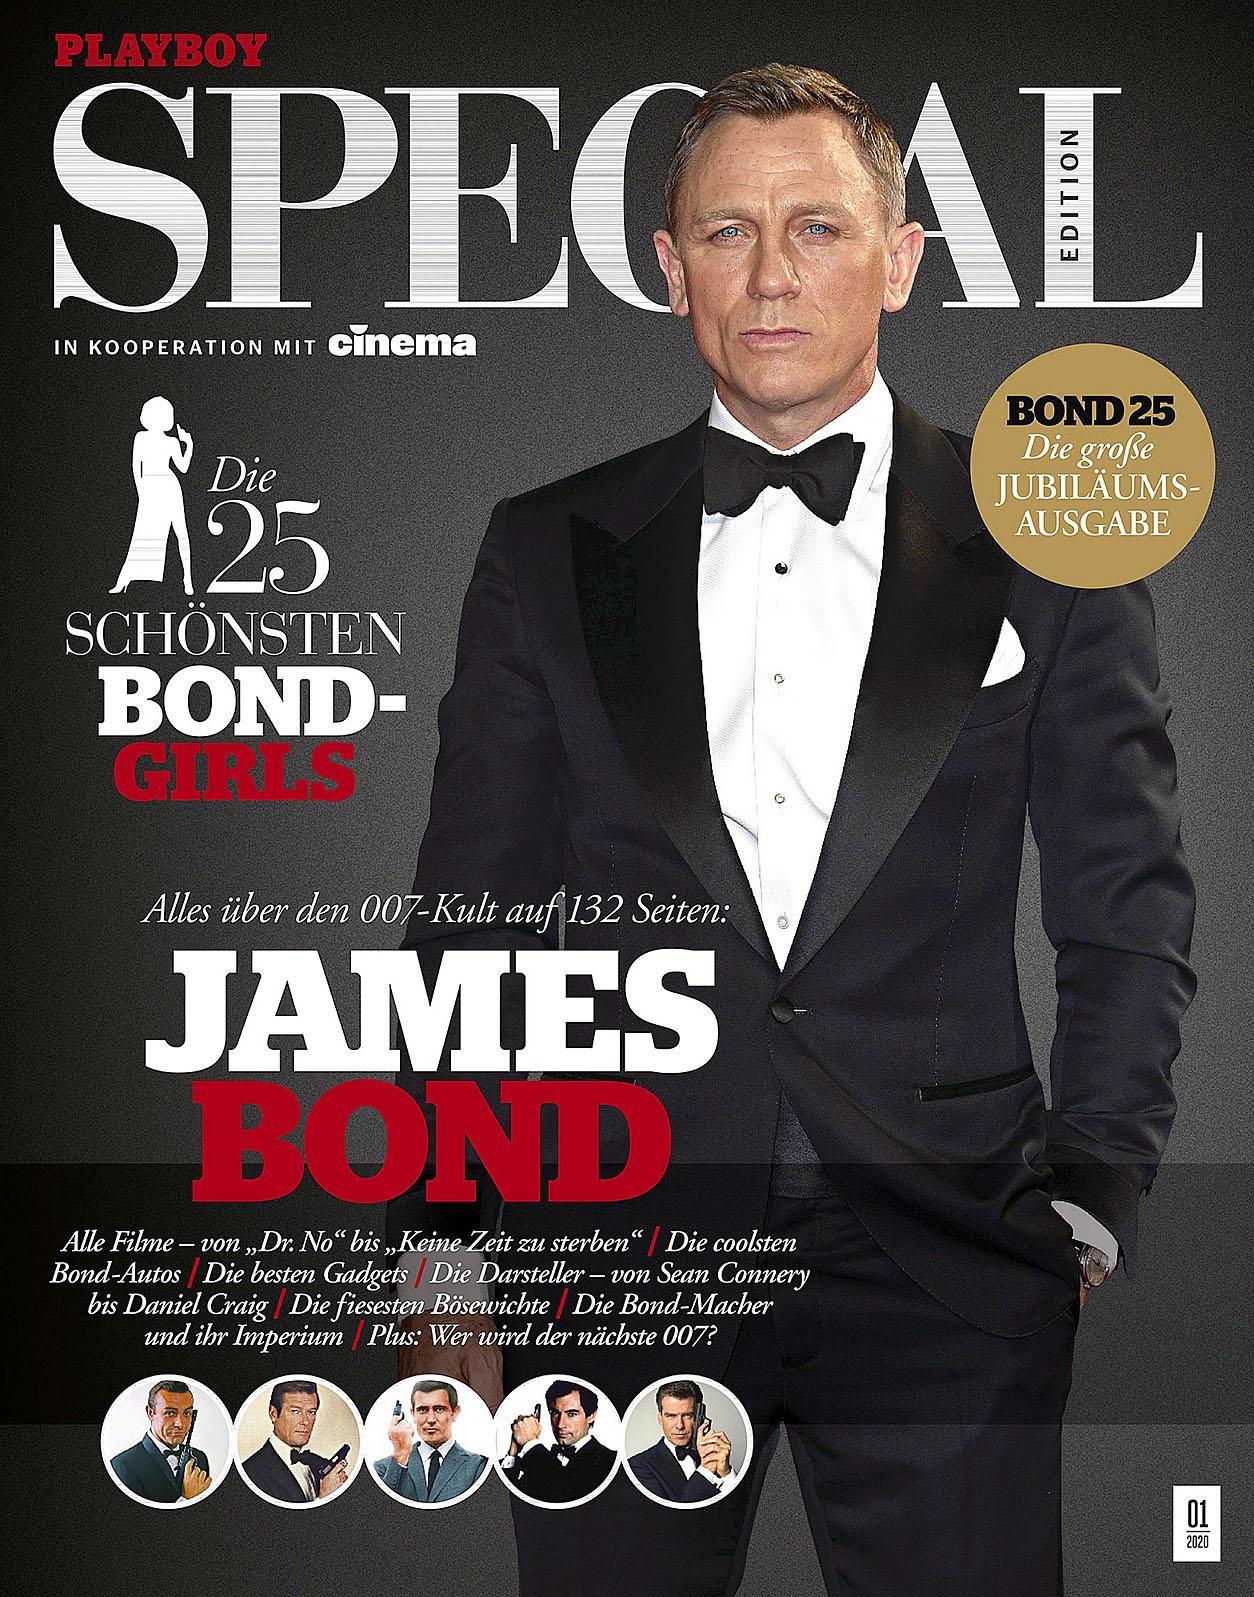 Playboy Ger Sp 2020 James Bond.jpg